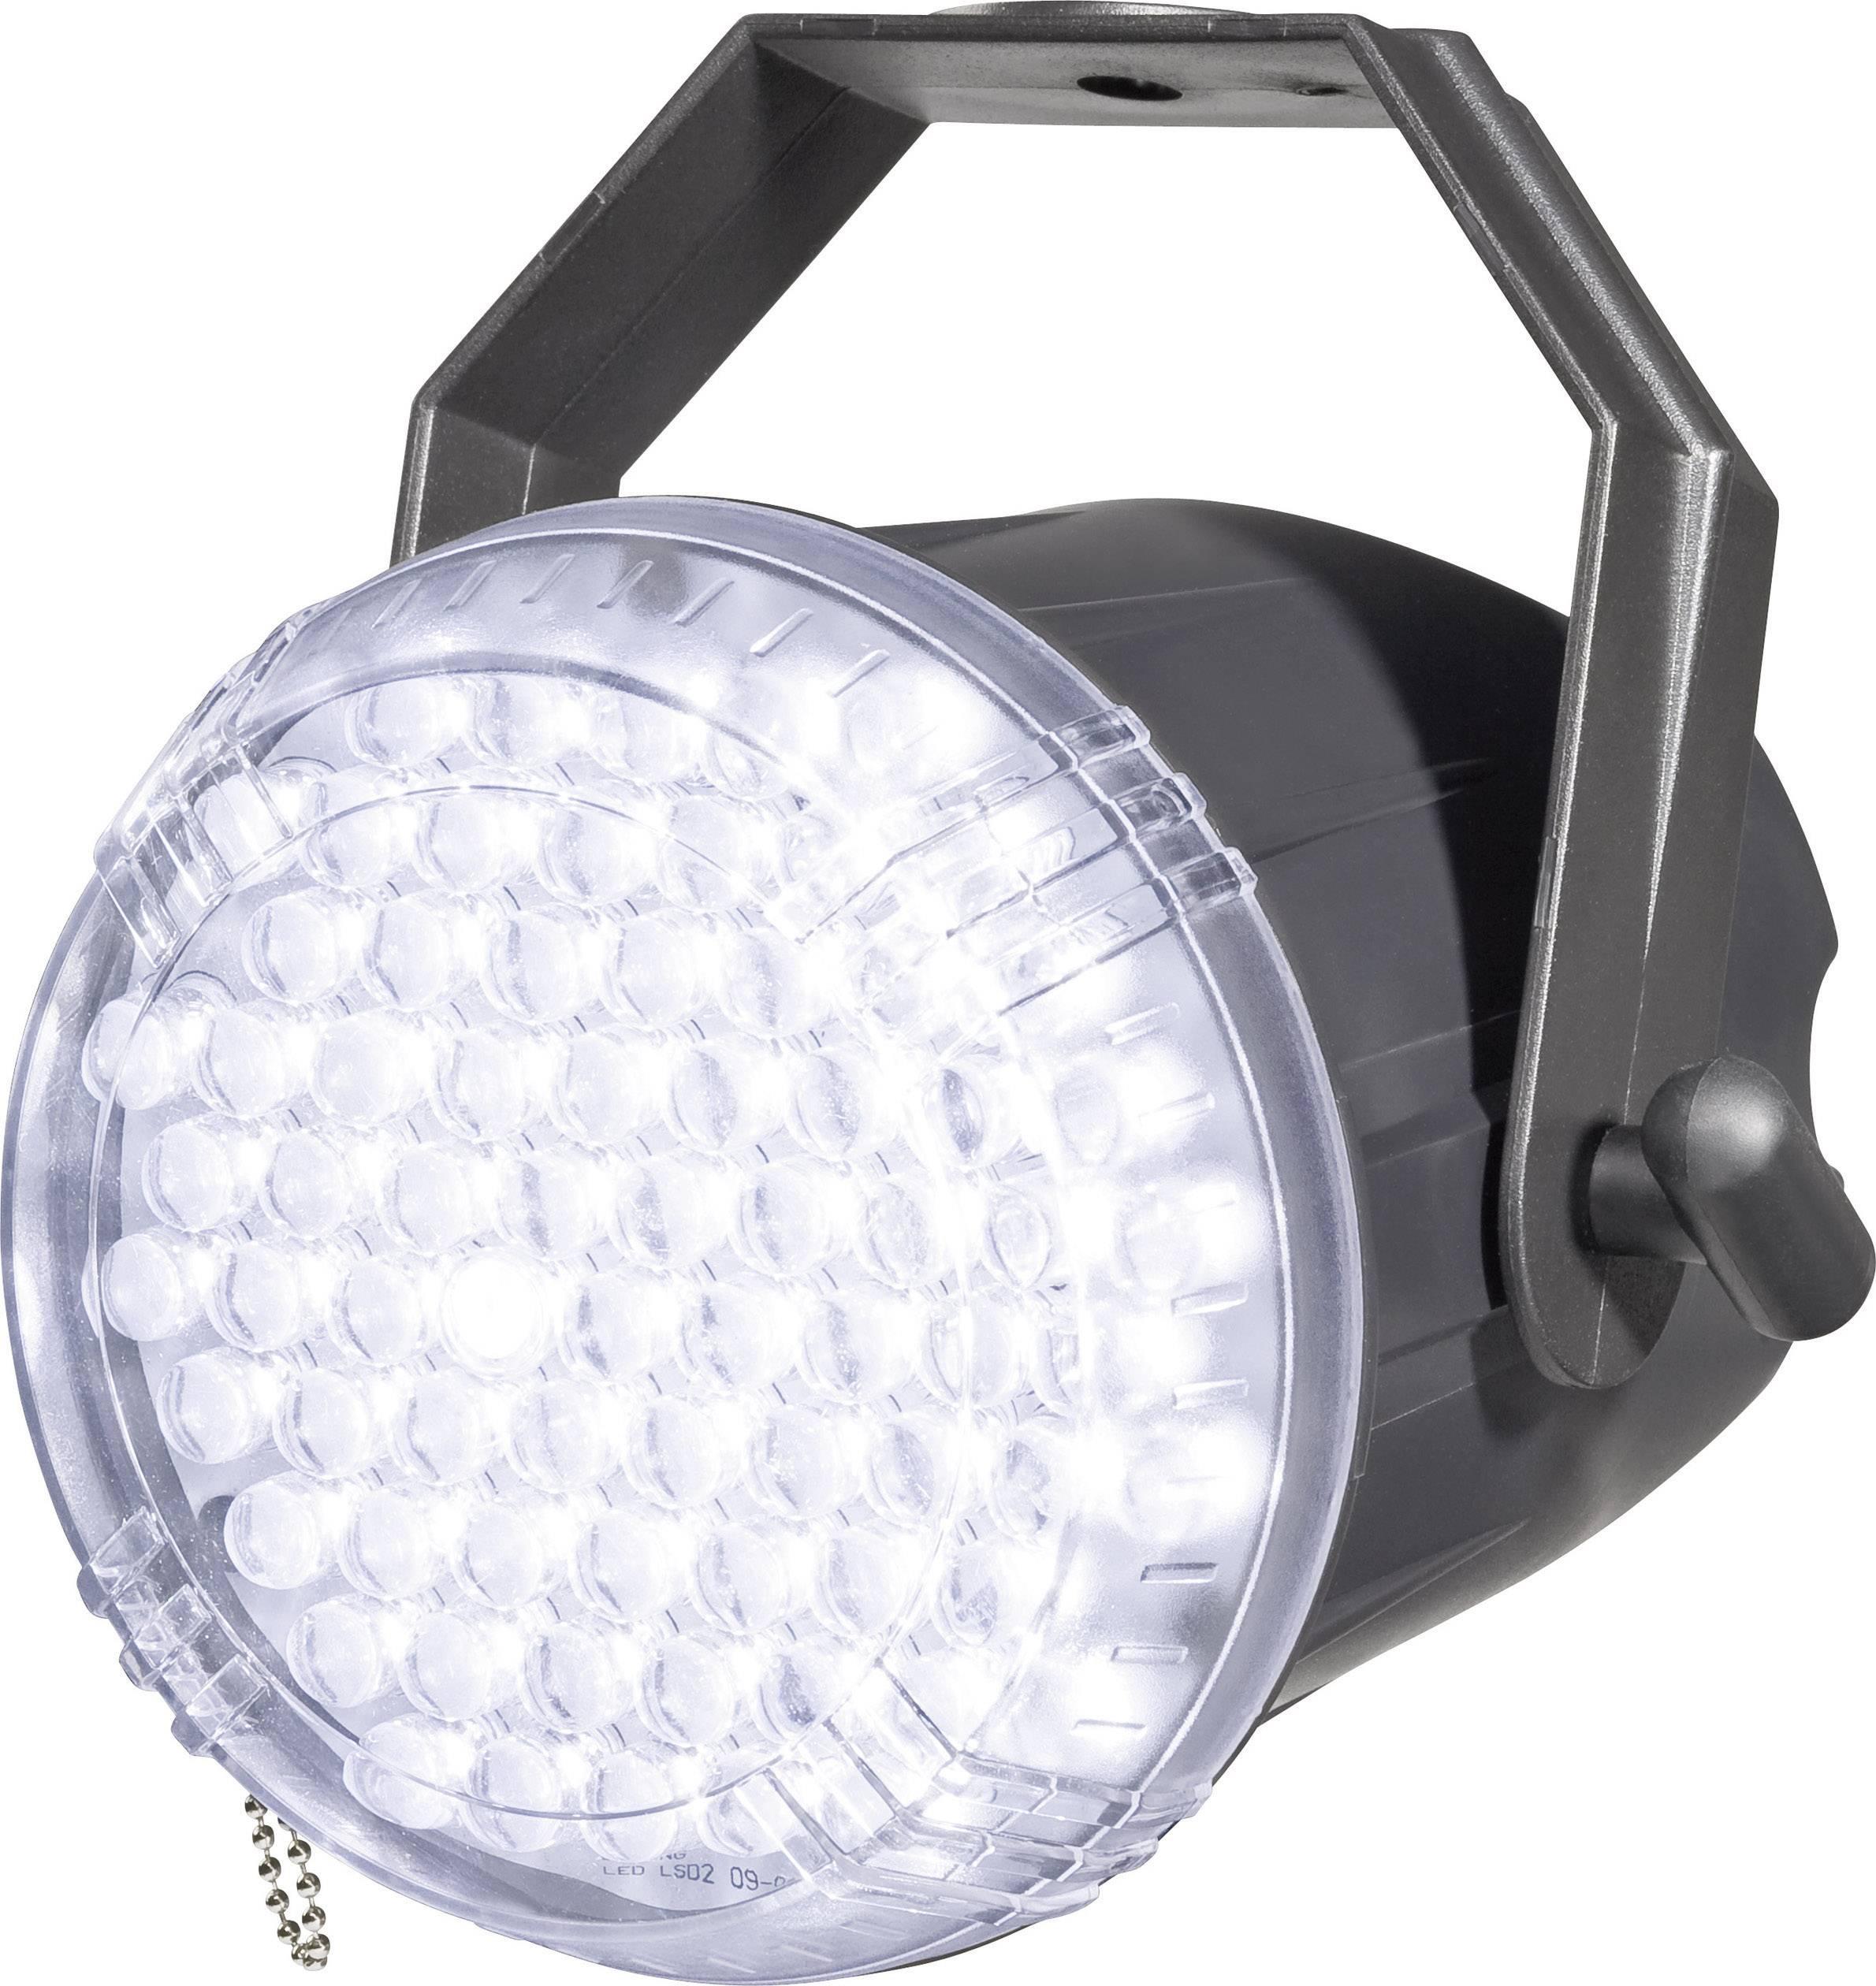 LEDstroboskop LED Techno Strobe 250 EC 52200828, počet LED:62, biela